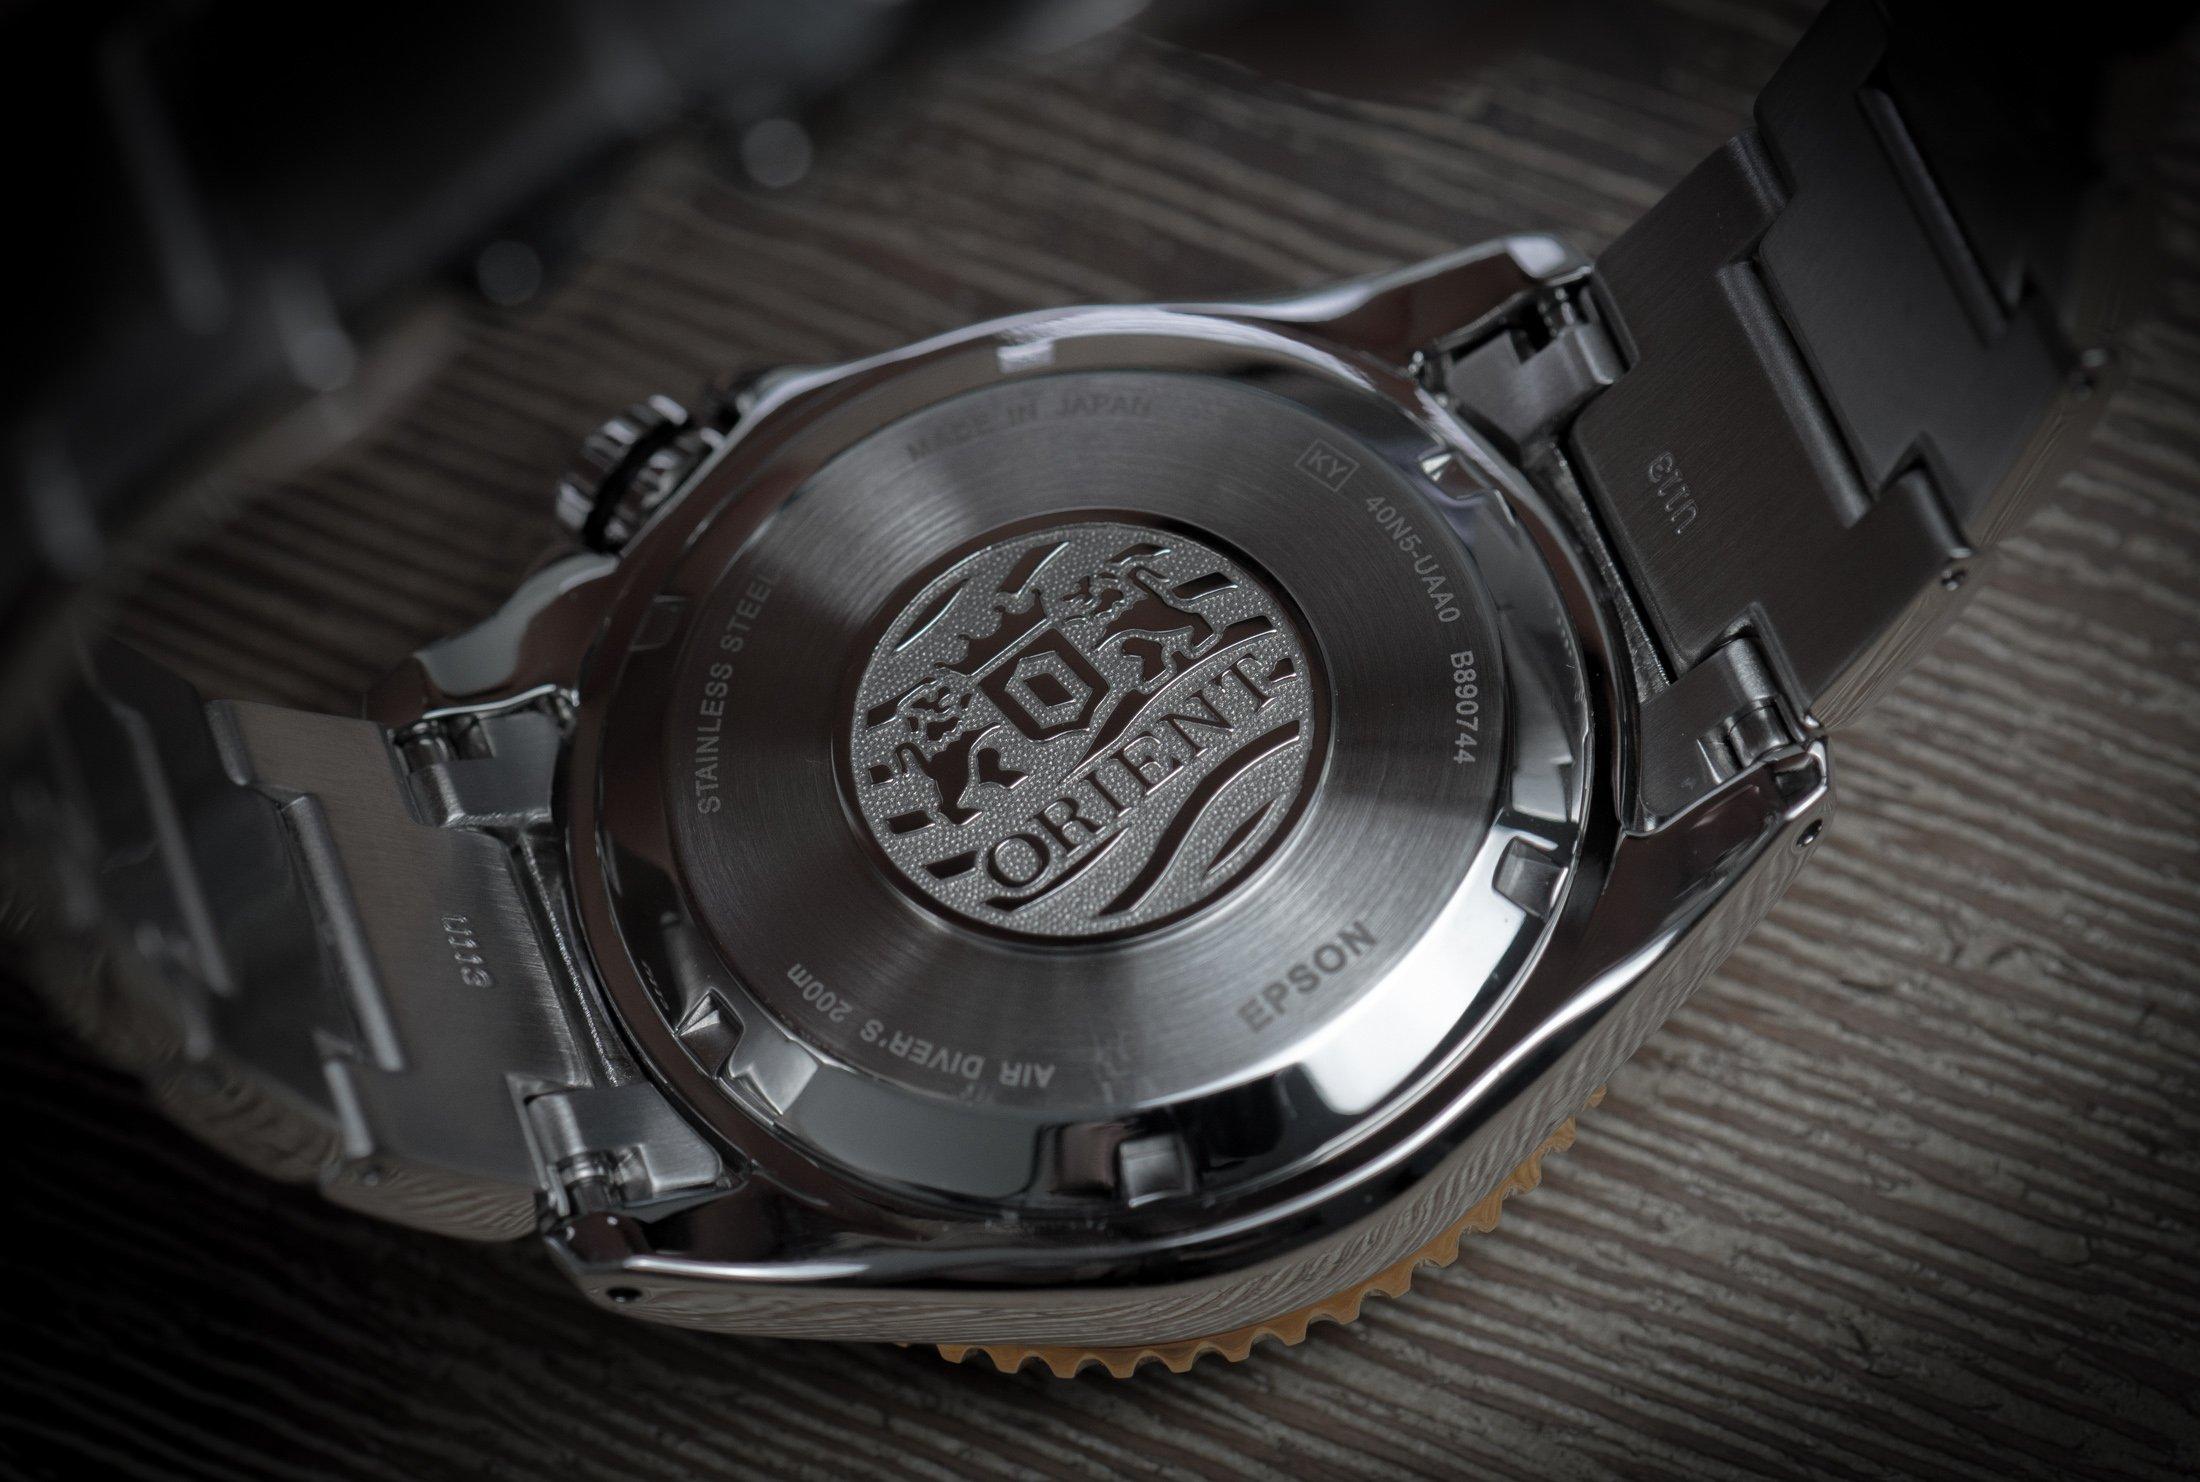 Orient Triton Seiko Epson Diver Automatic